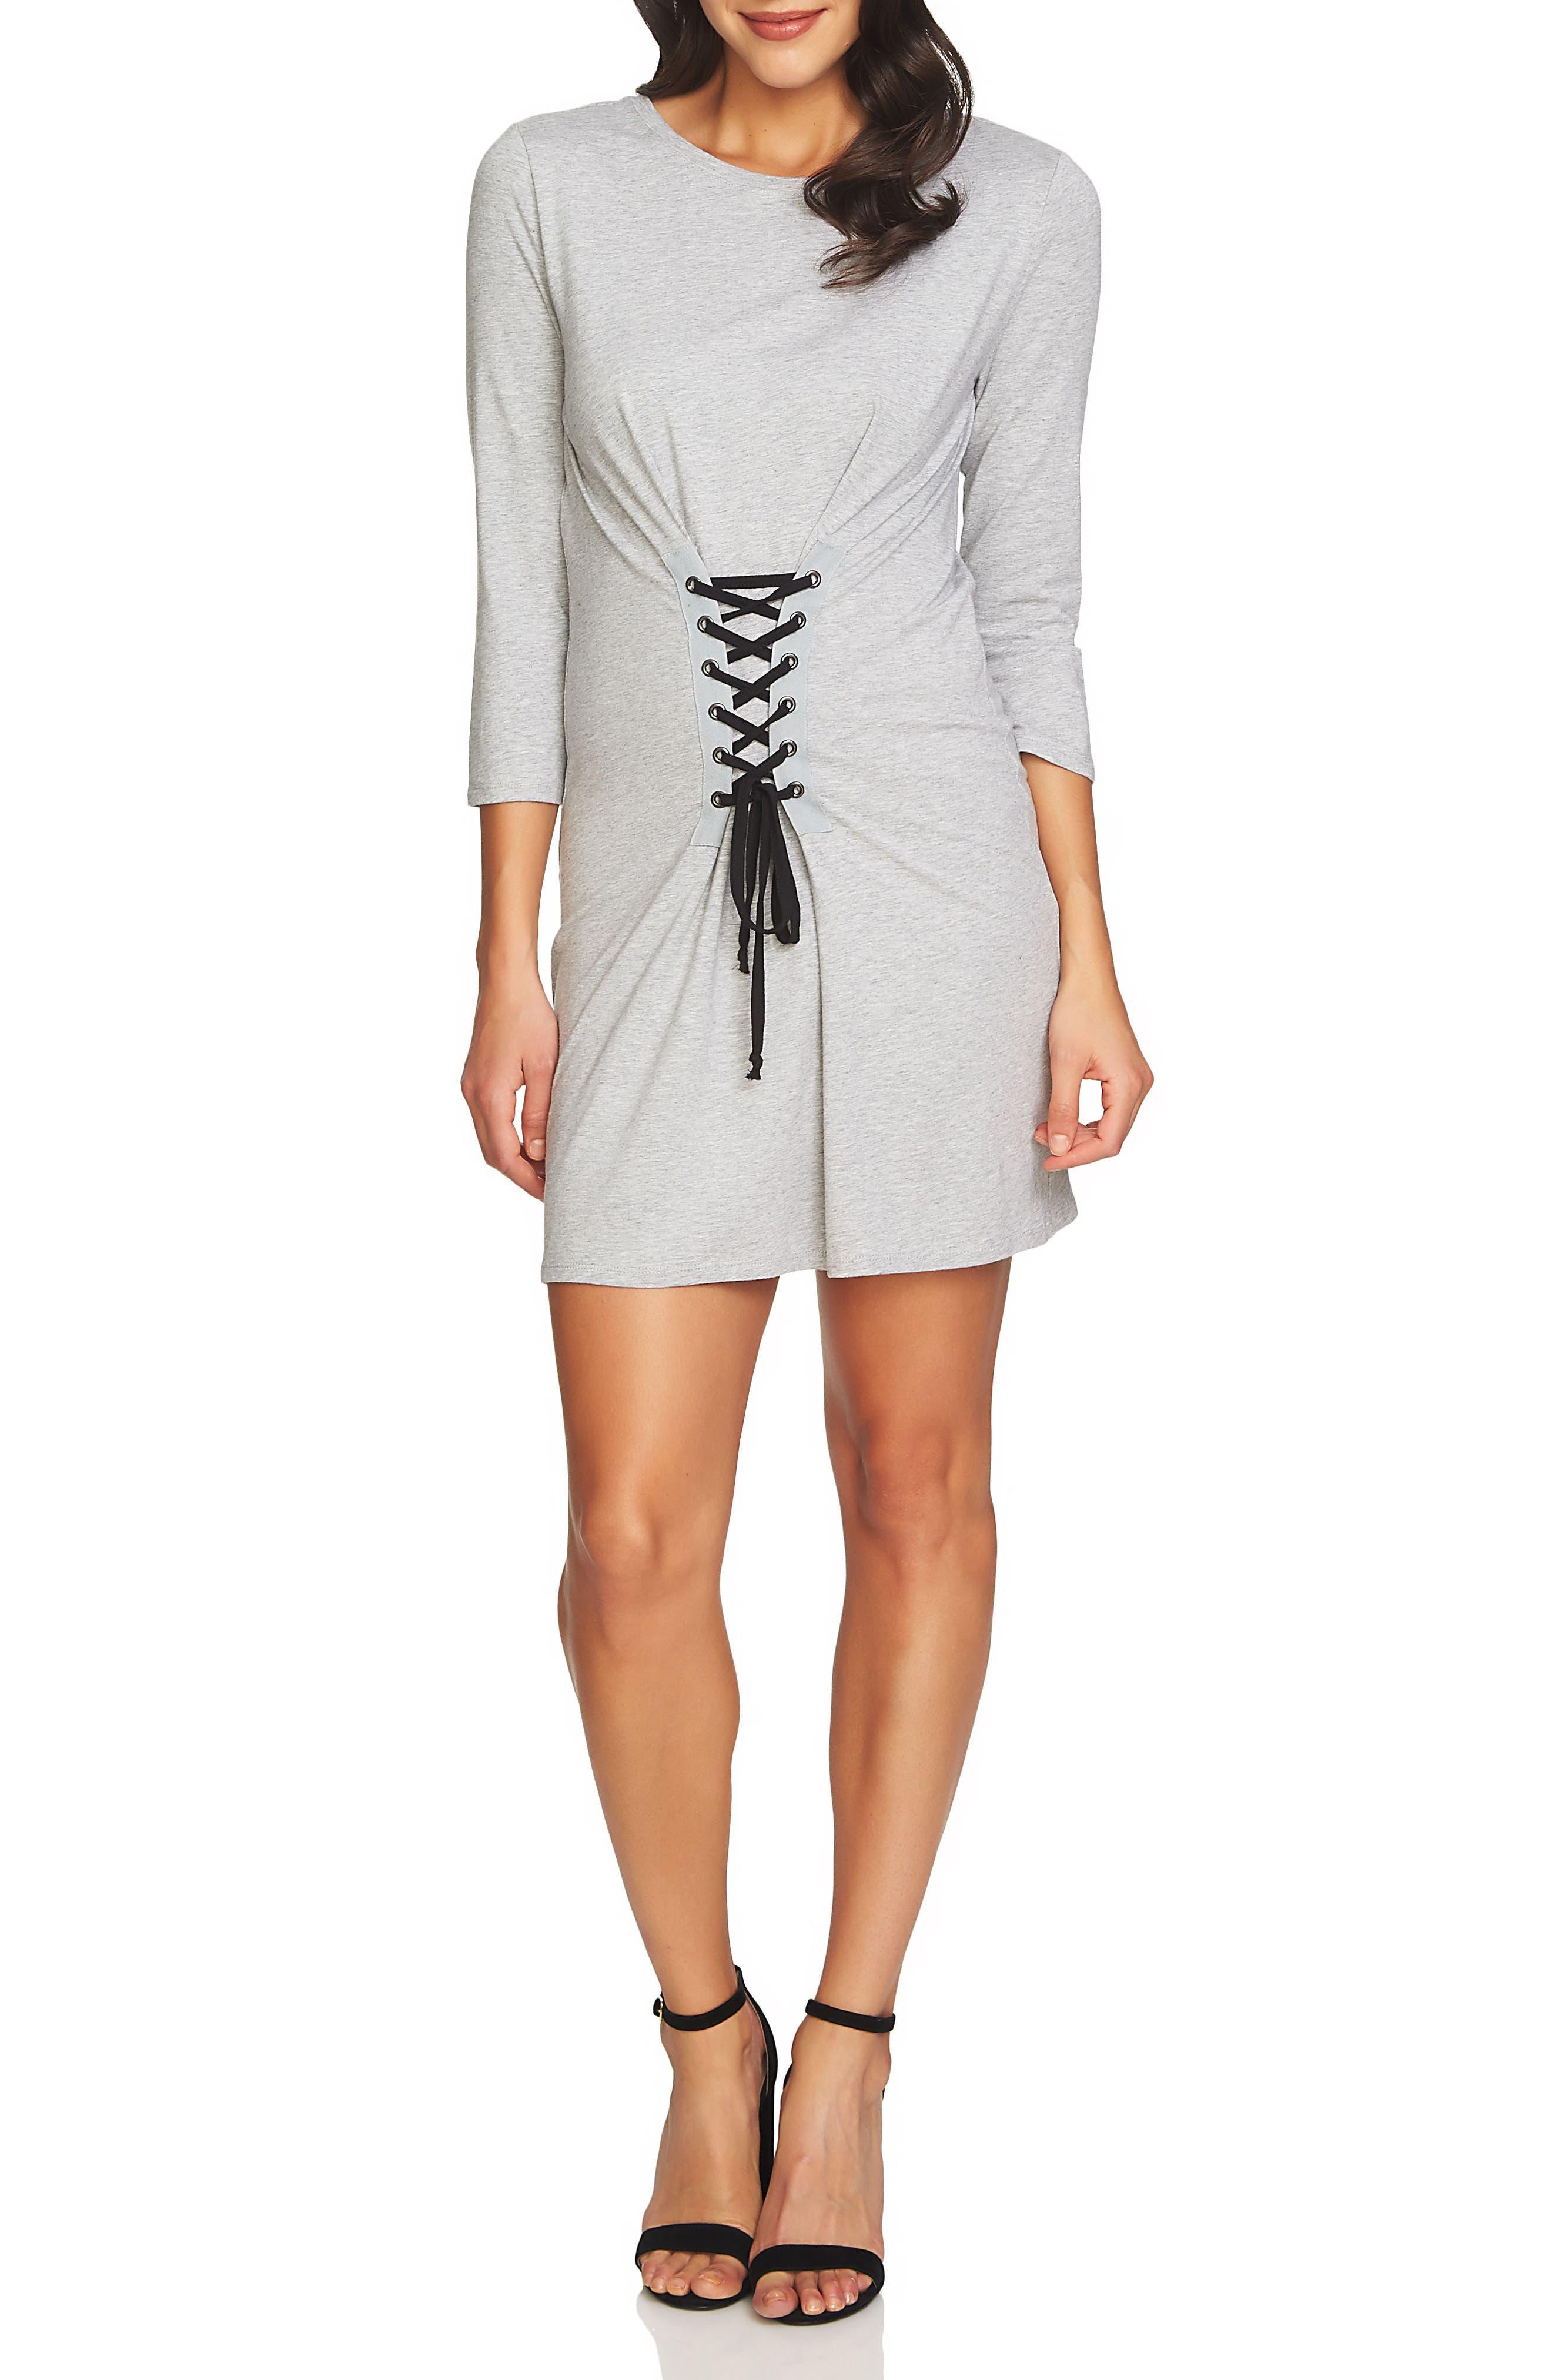 Main Image - 1.STATE Corset Detail Knit Dress